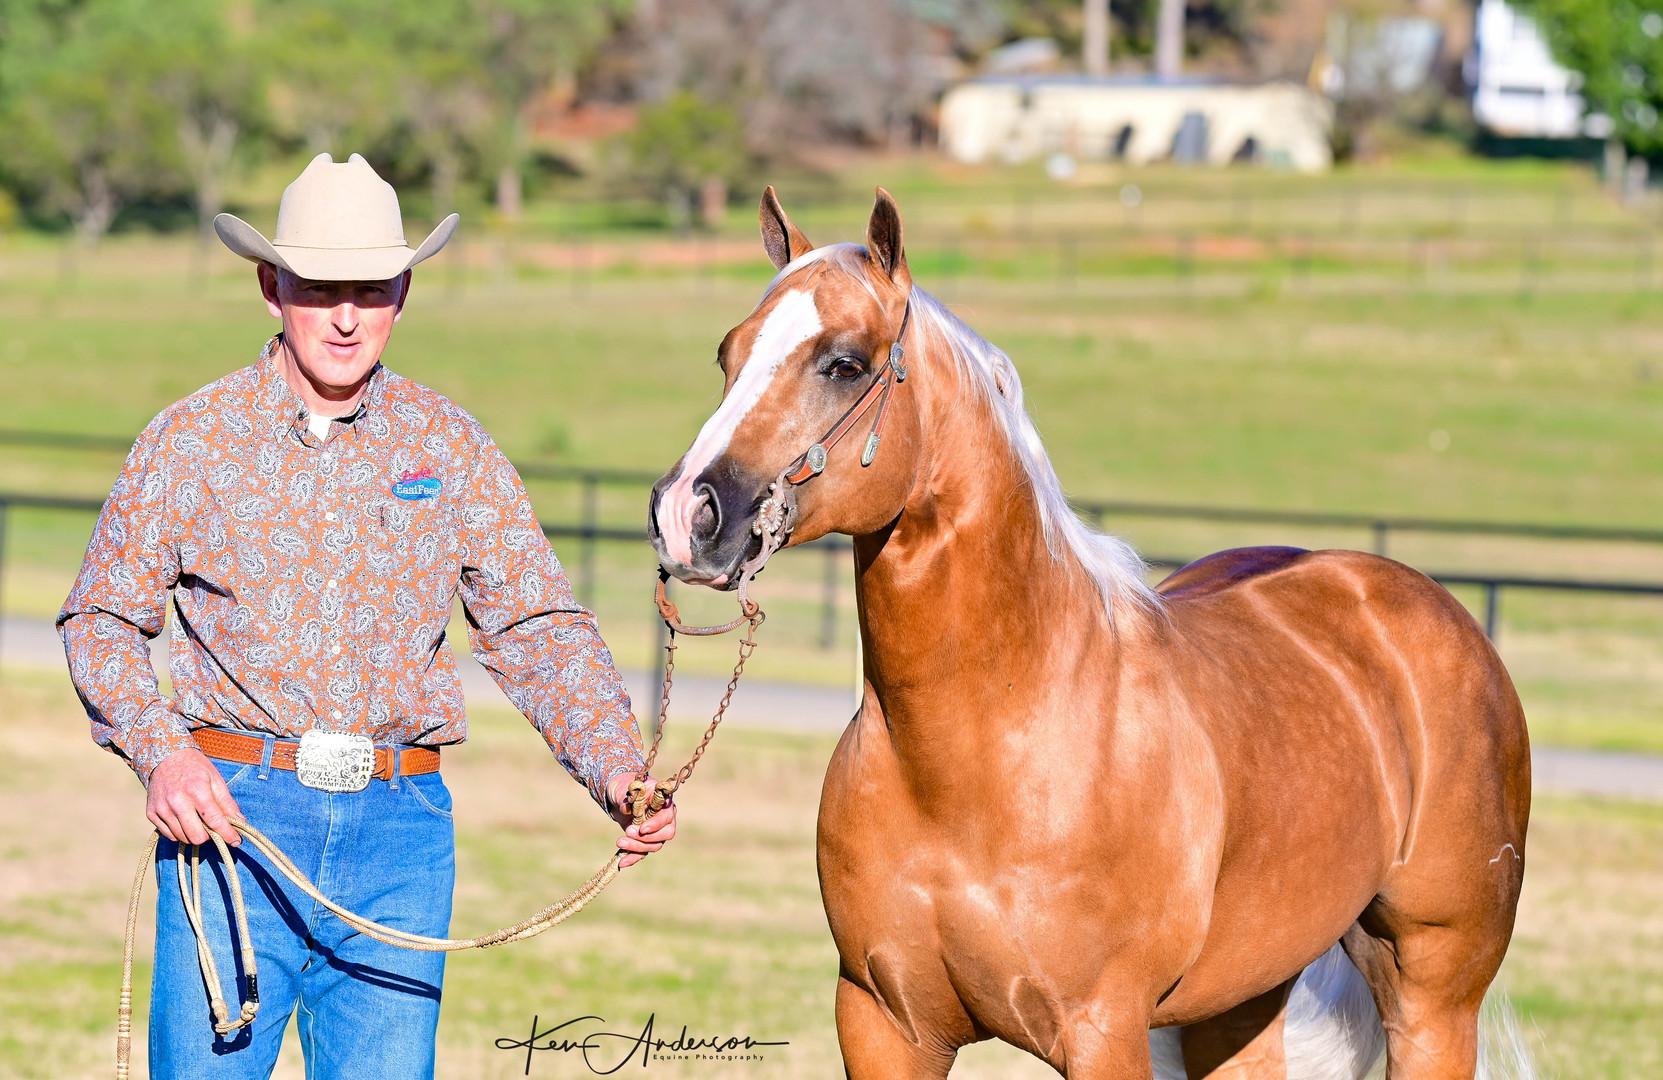 rob lawson pally stallion 179.jpg